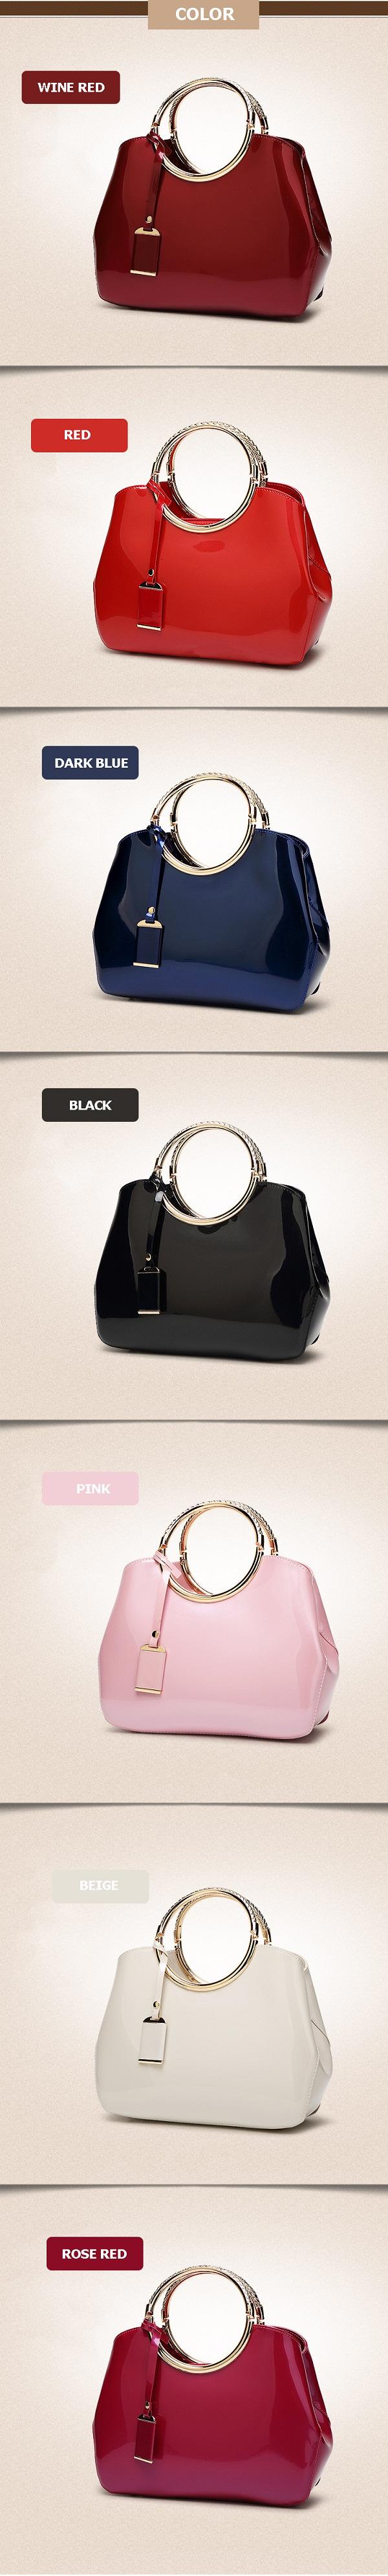 Women High Quality Patent Leather Elegant Handbag